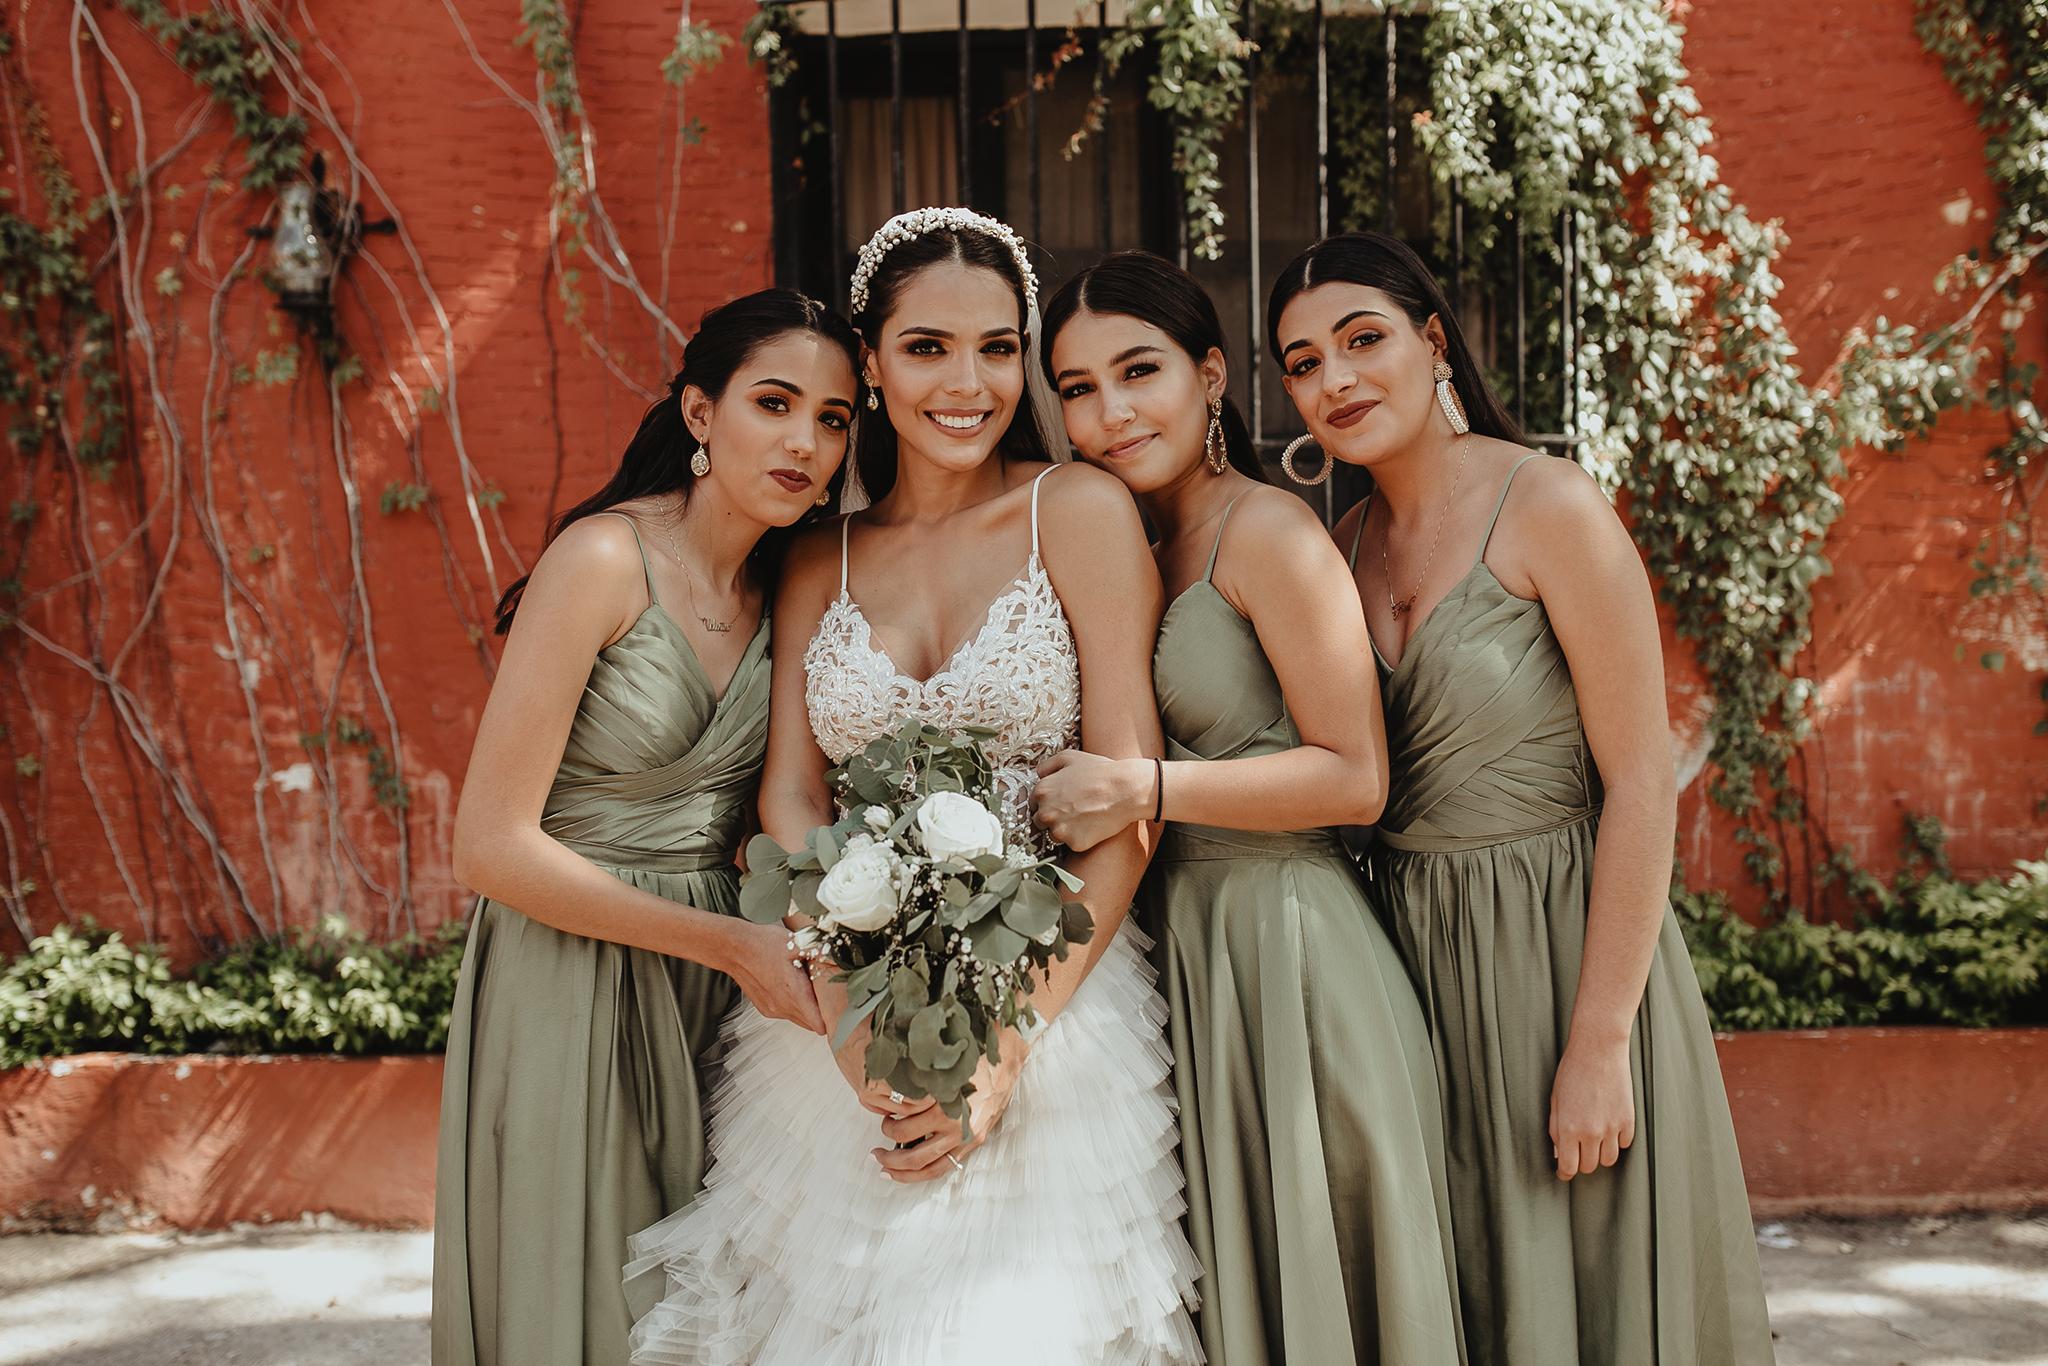 0478R&F__WeddingDestination_Weddingmerida_BodaMexico_FotografoDeBodas_FabrizioSimoneenFotografo.jpg